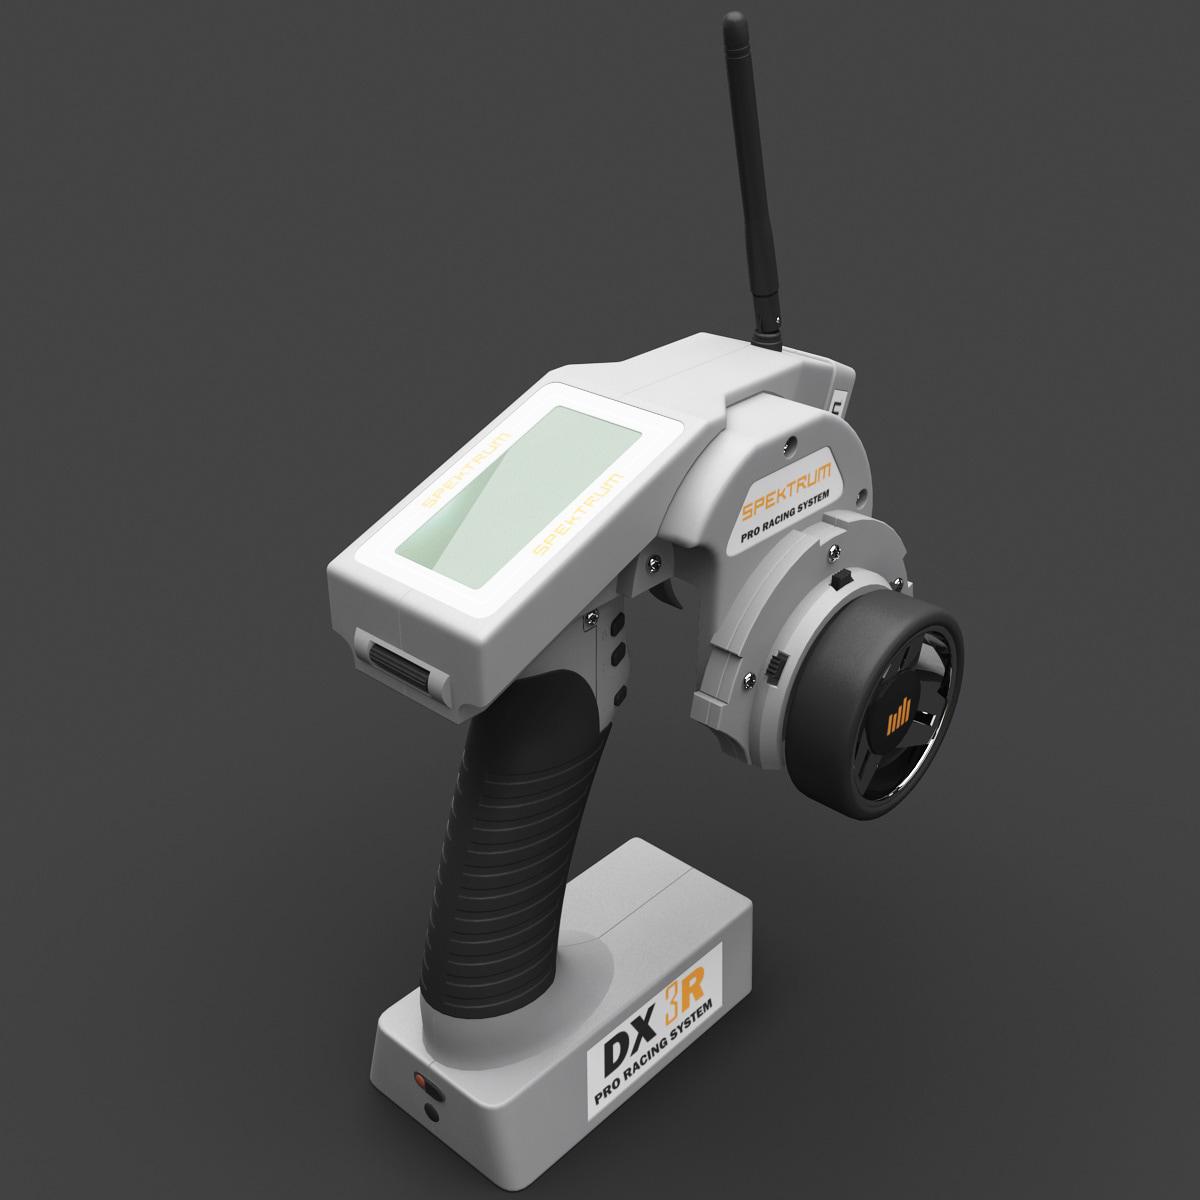 Radio_Control_Transmitter_Spektrum_DX3R_001.jpg